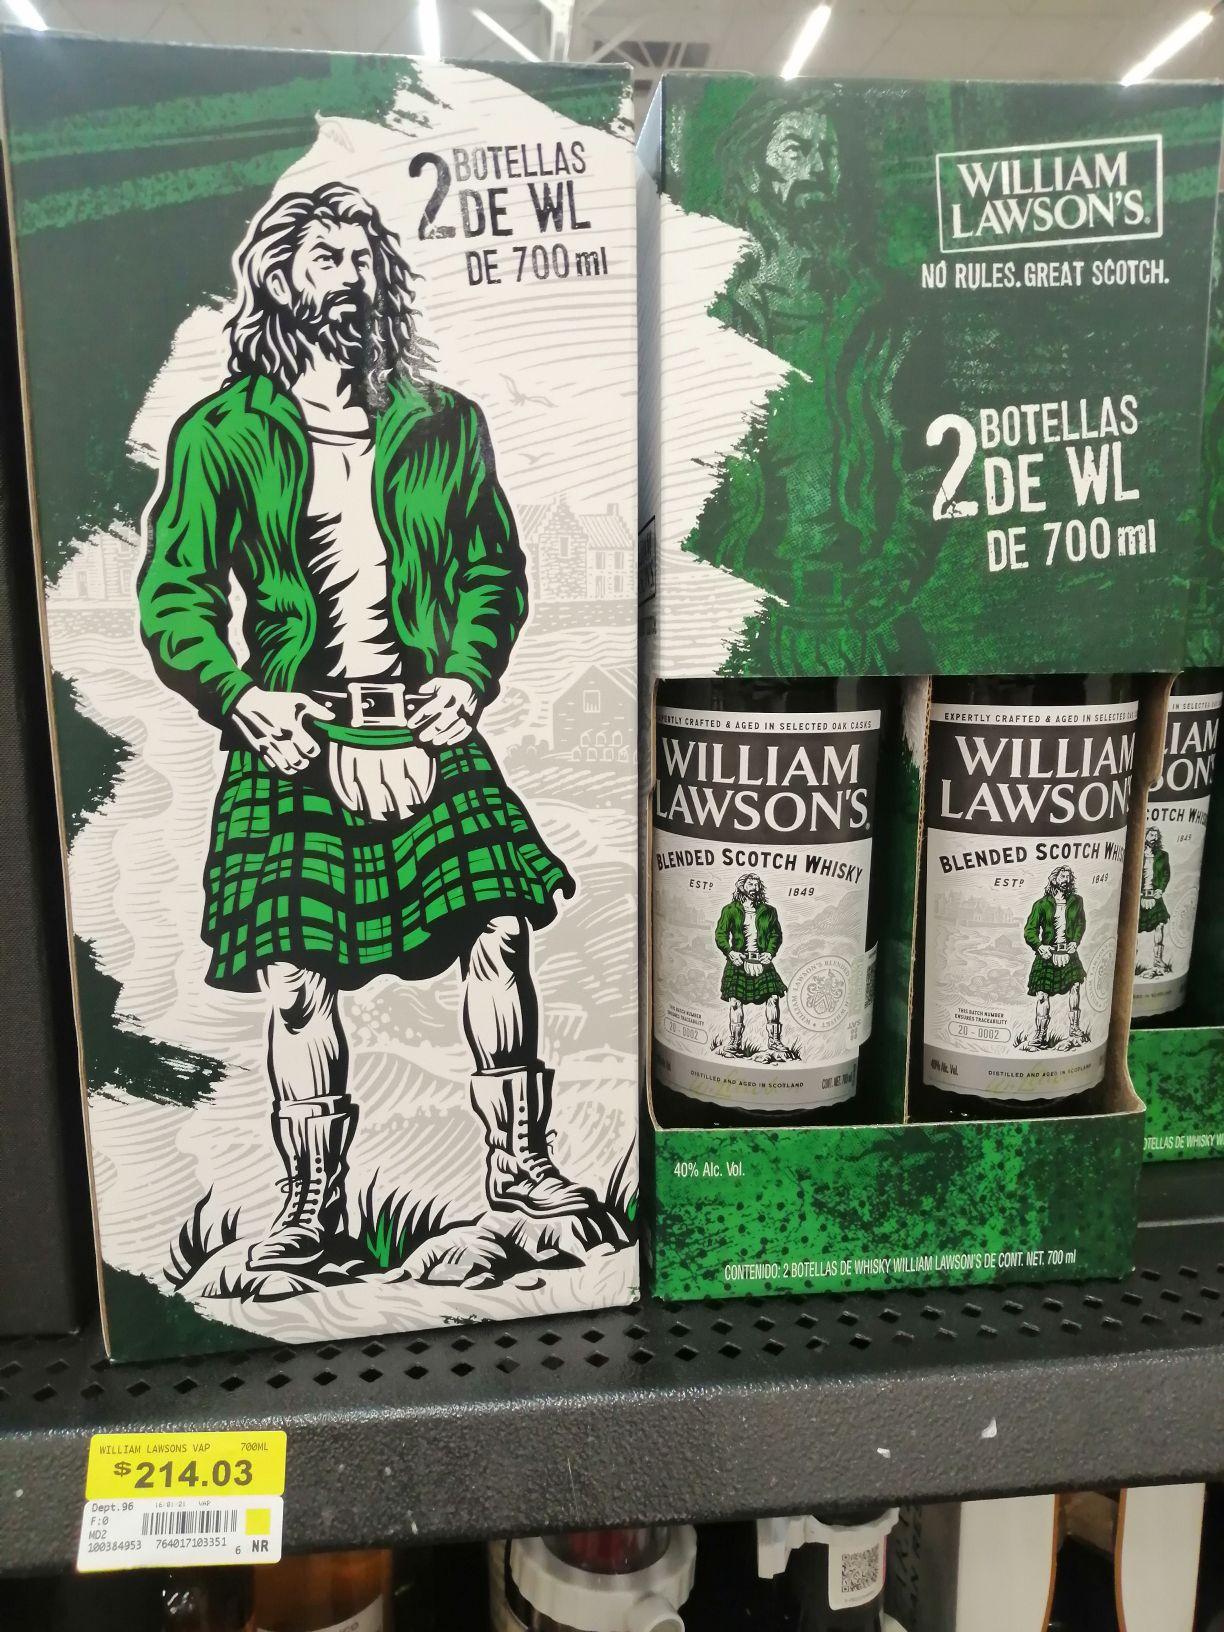 Walmart: William Lawsons: 2 botellas de 700mL c/u.